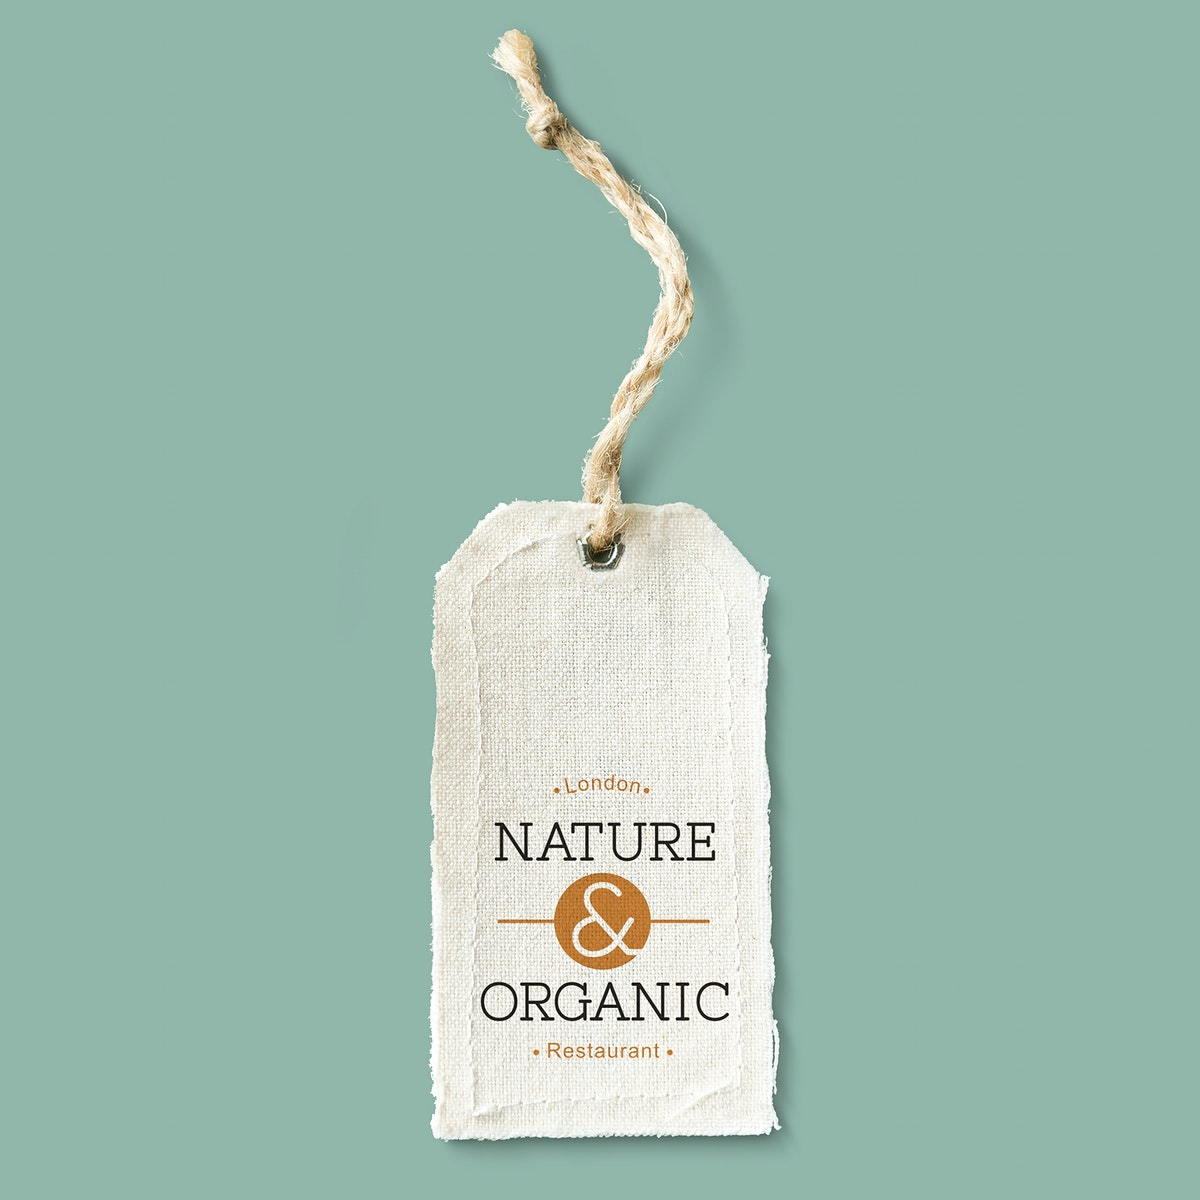 Natural cotton cloth label mockup